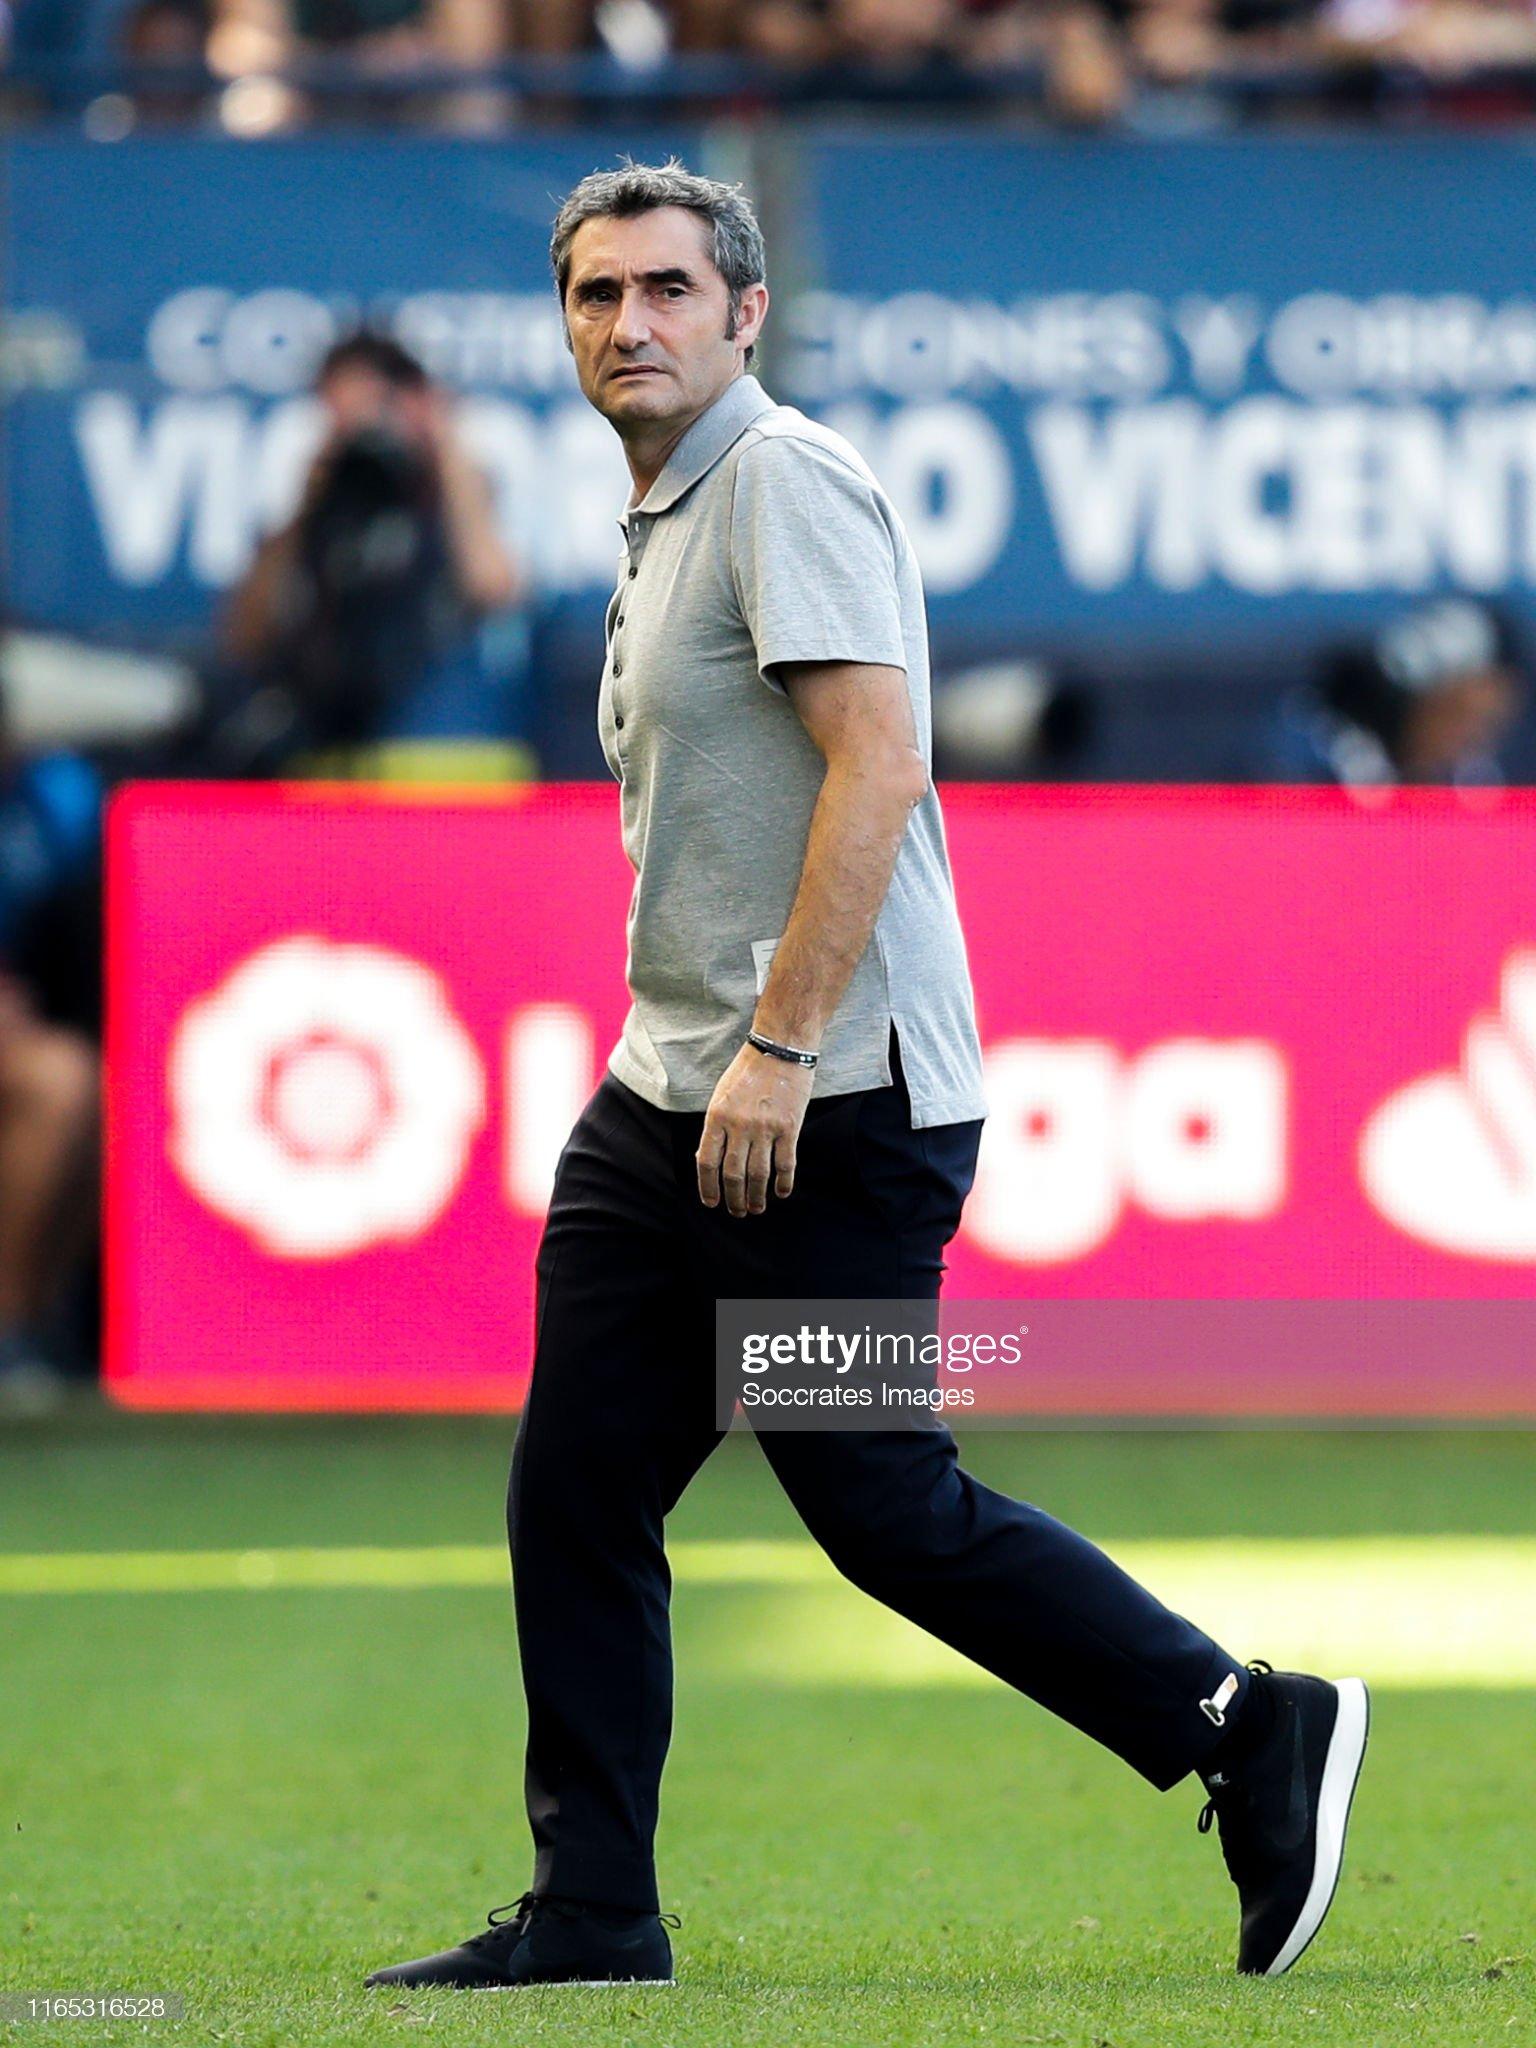 صور مباراة : أوساسونا - برشلونة 2-2 ( 31-08-2019 )  Coach-ernesto-valverde-of-fc-barcelona-during-the-la-liga-santander-picture-id1165316528?s=2048x2048